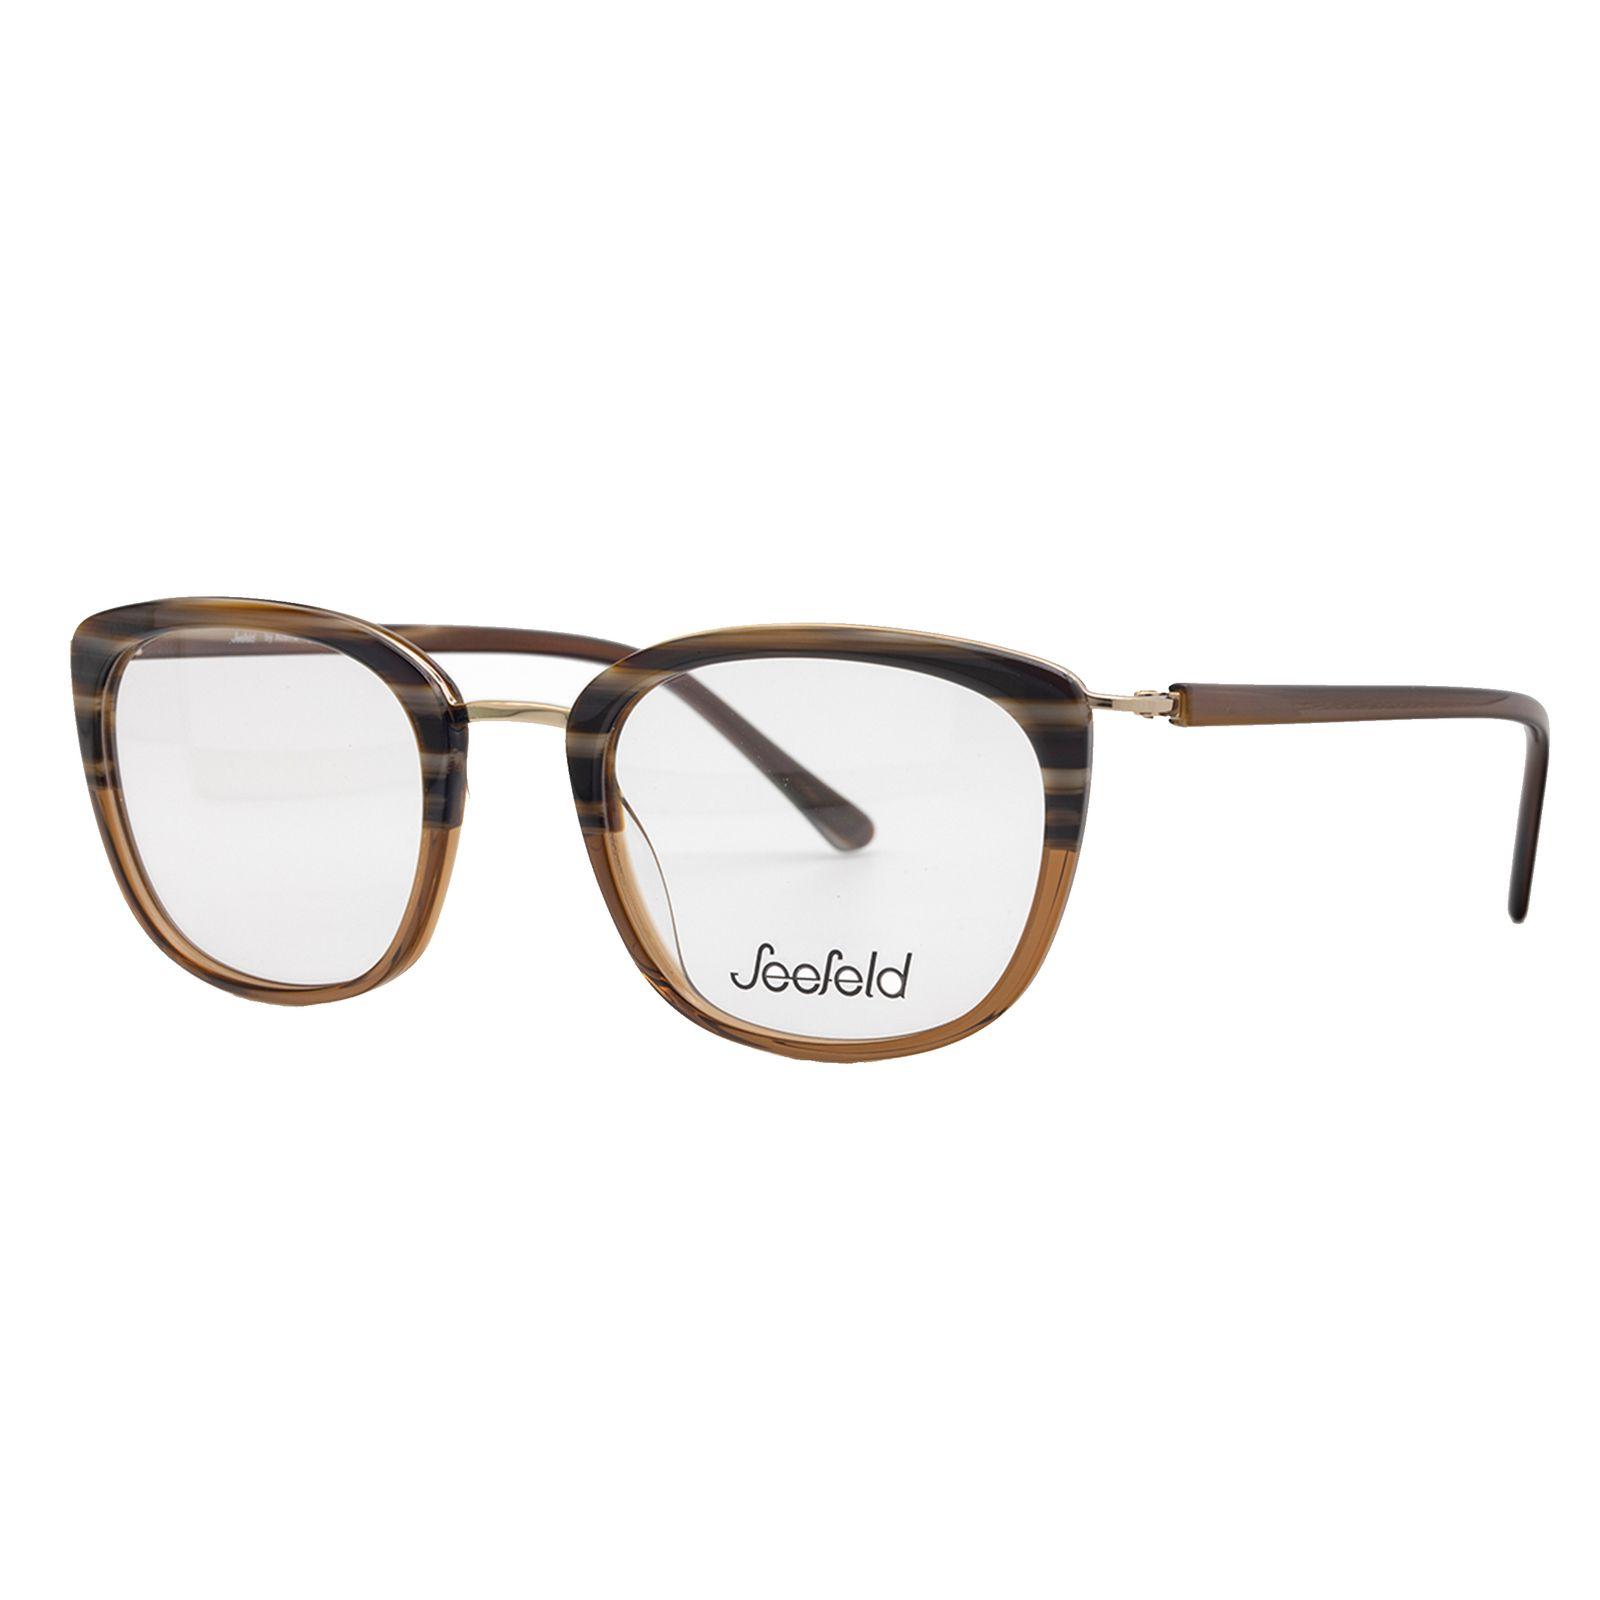 عینک طبی سیفلد مدل Mariazel C2 -  - 3